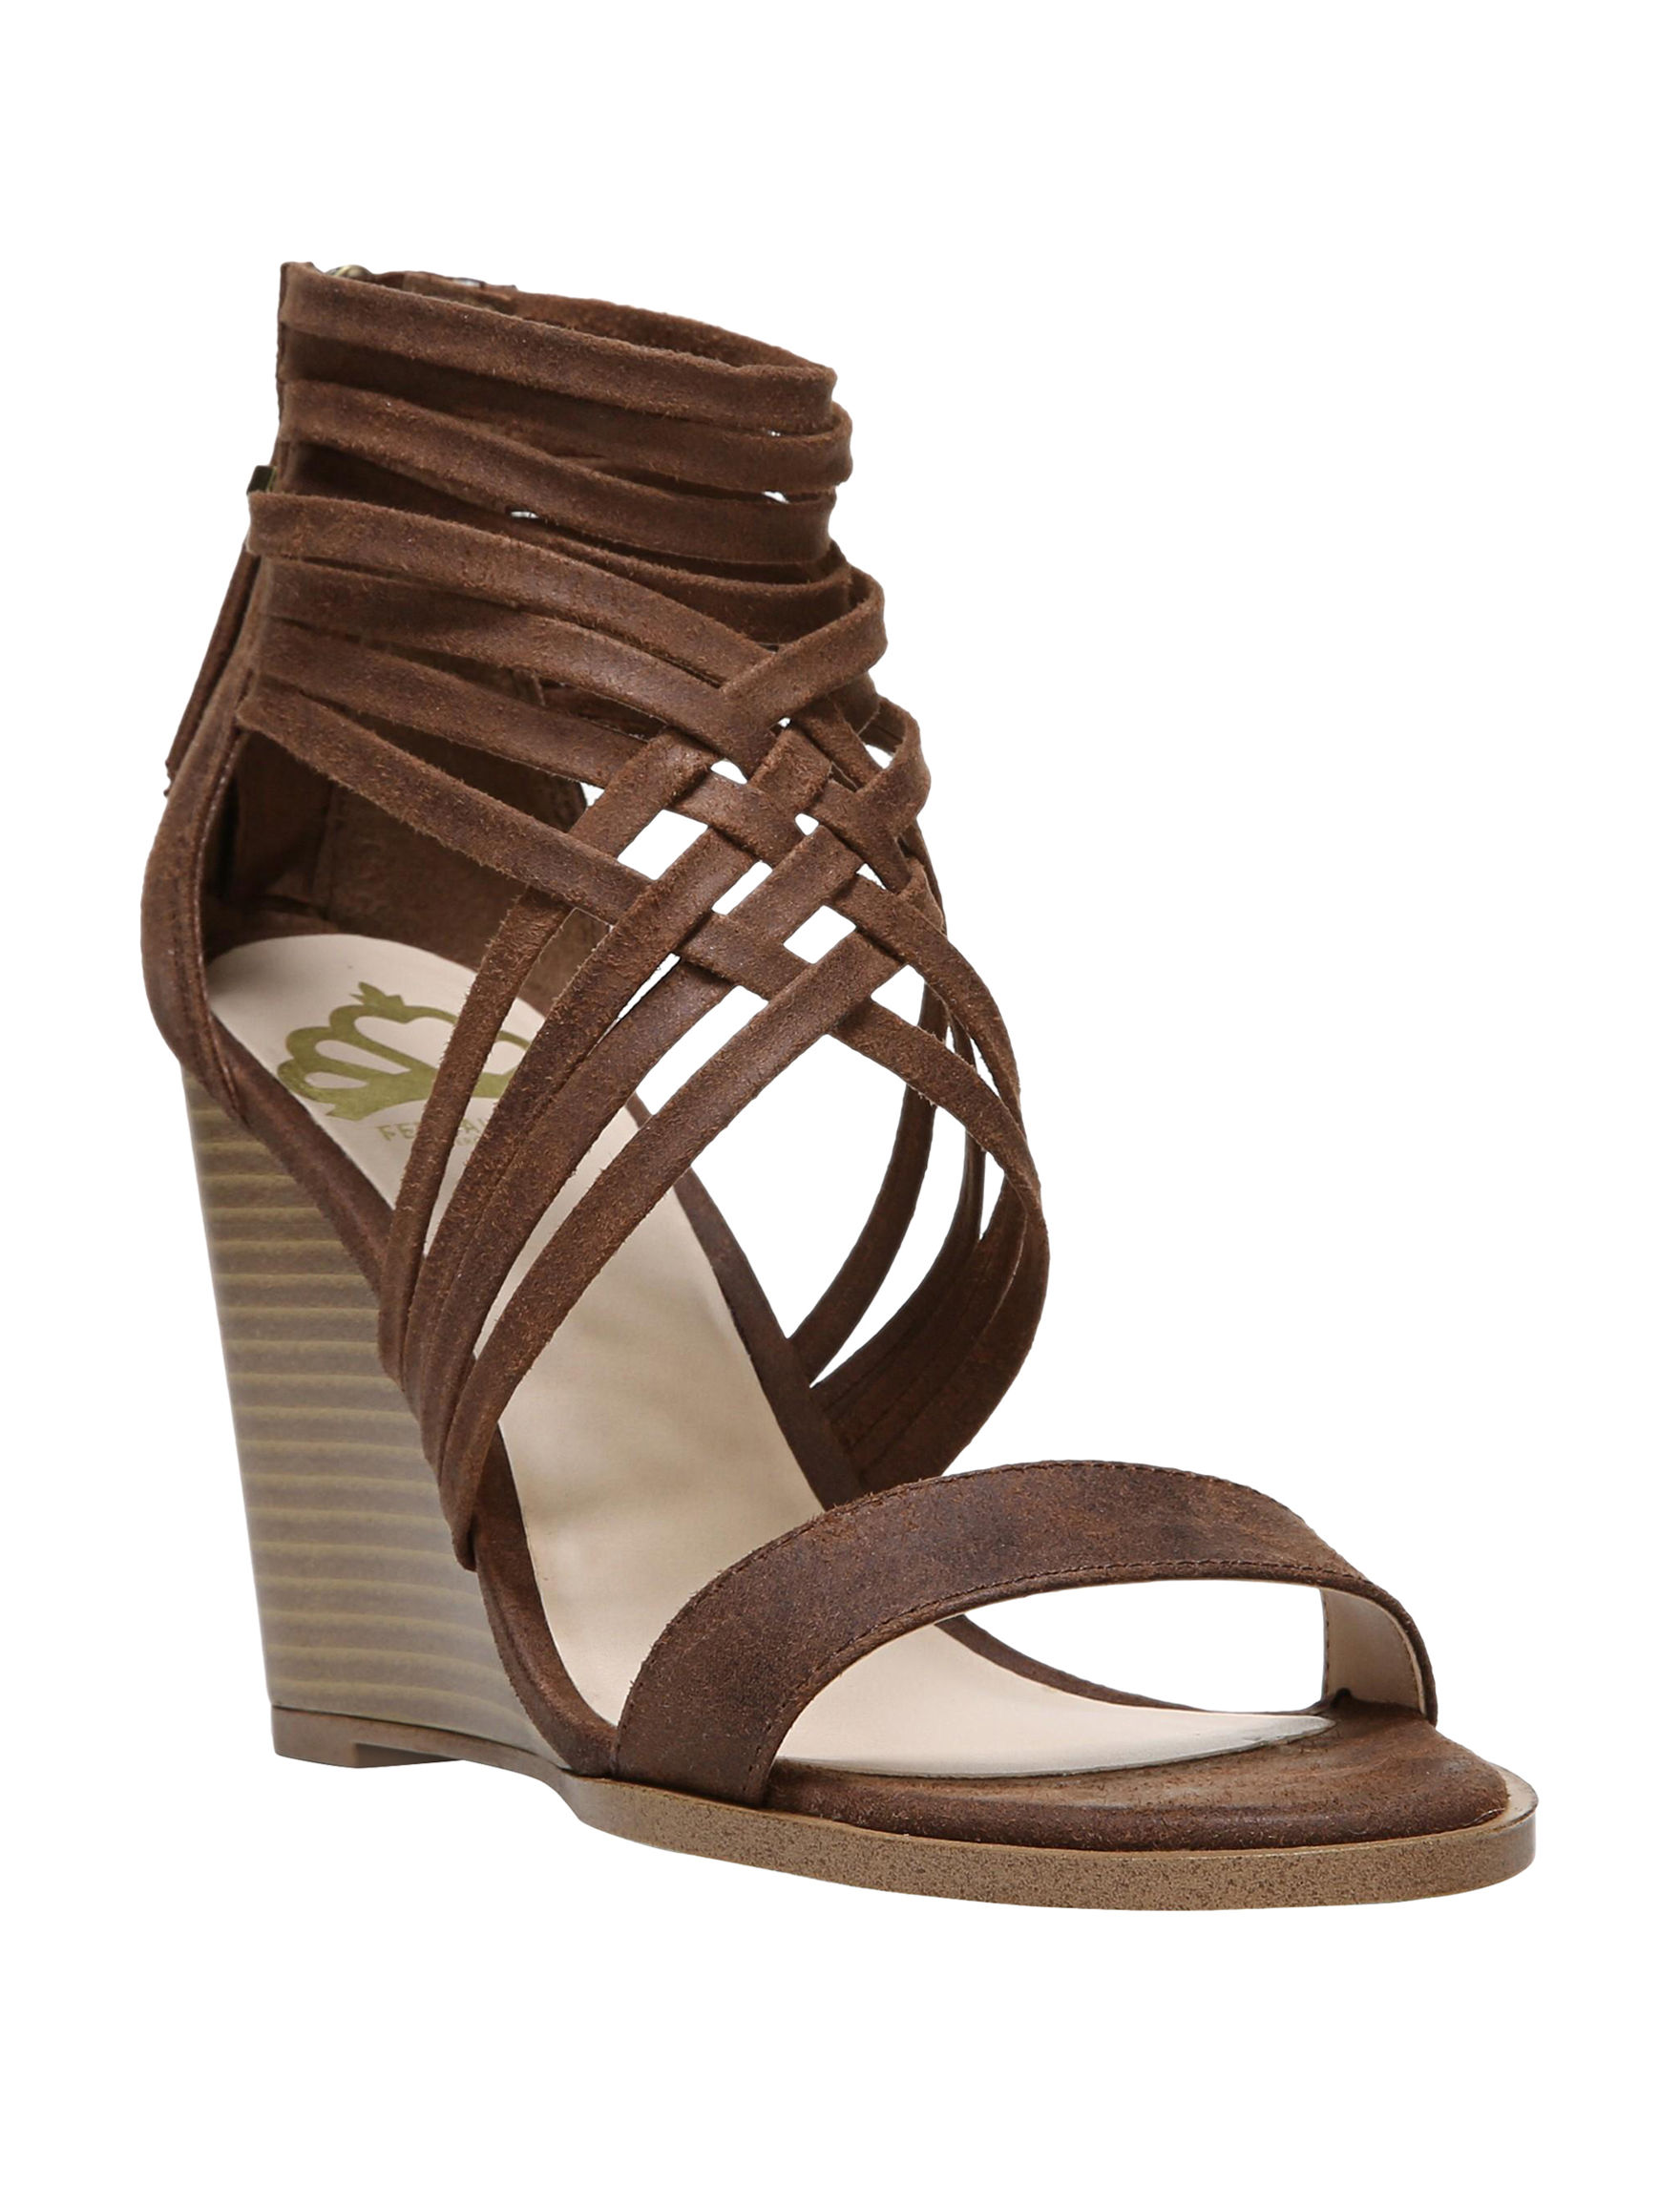 Fergie Tan Wedge Sandals